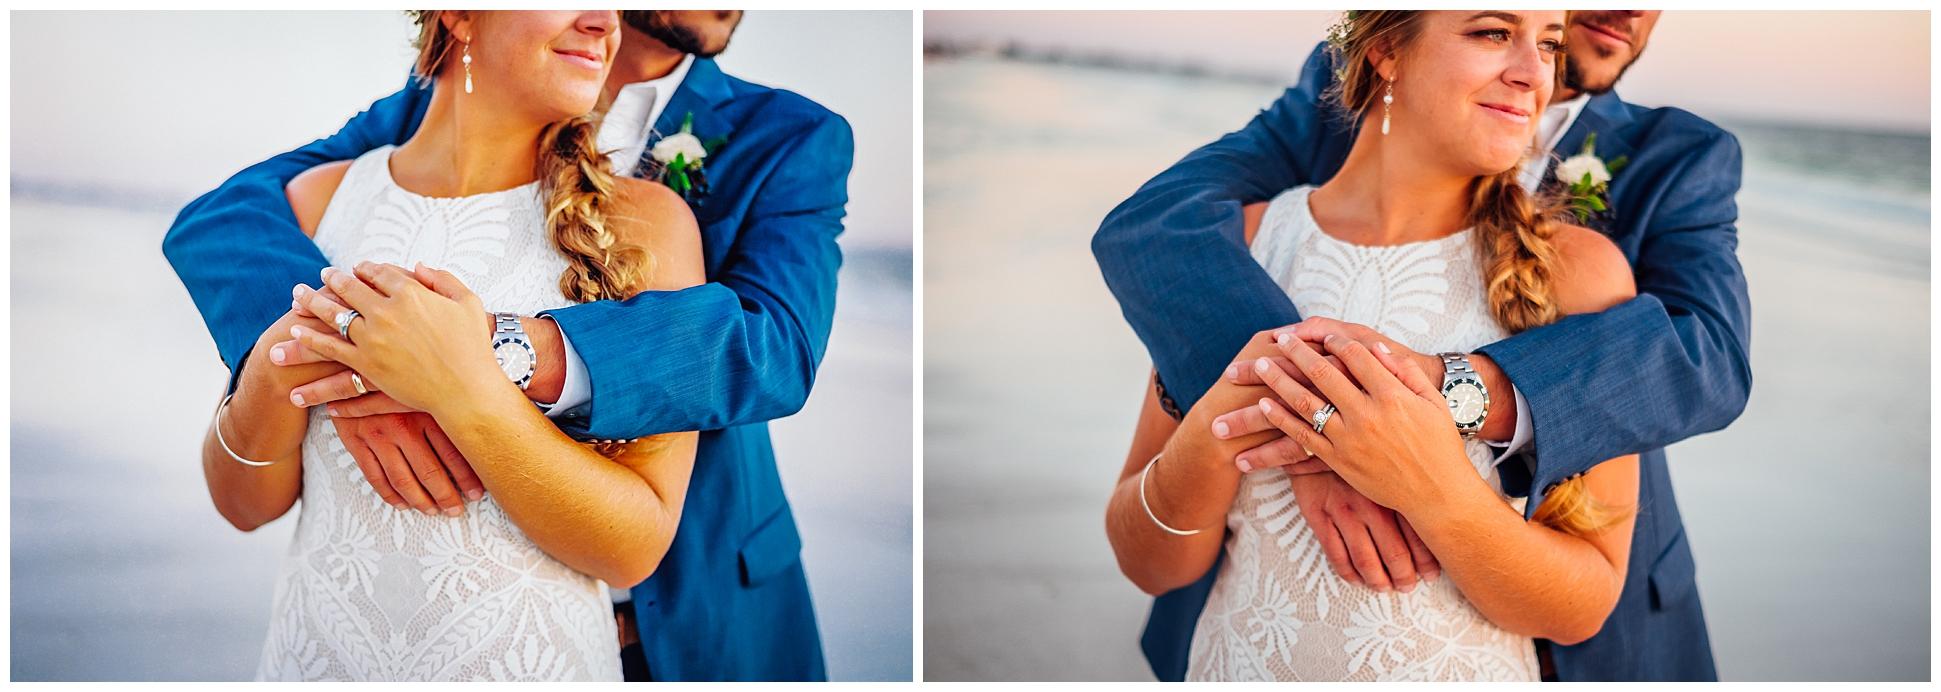 medium-format-film-vs-digital-wedding-photography-florida-beach_0023.jpg